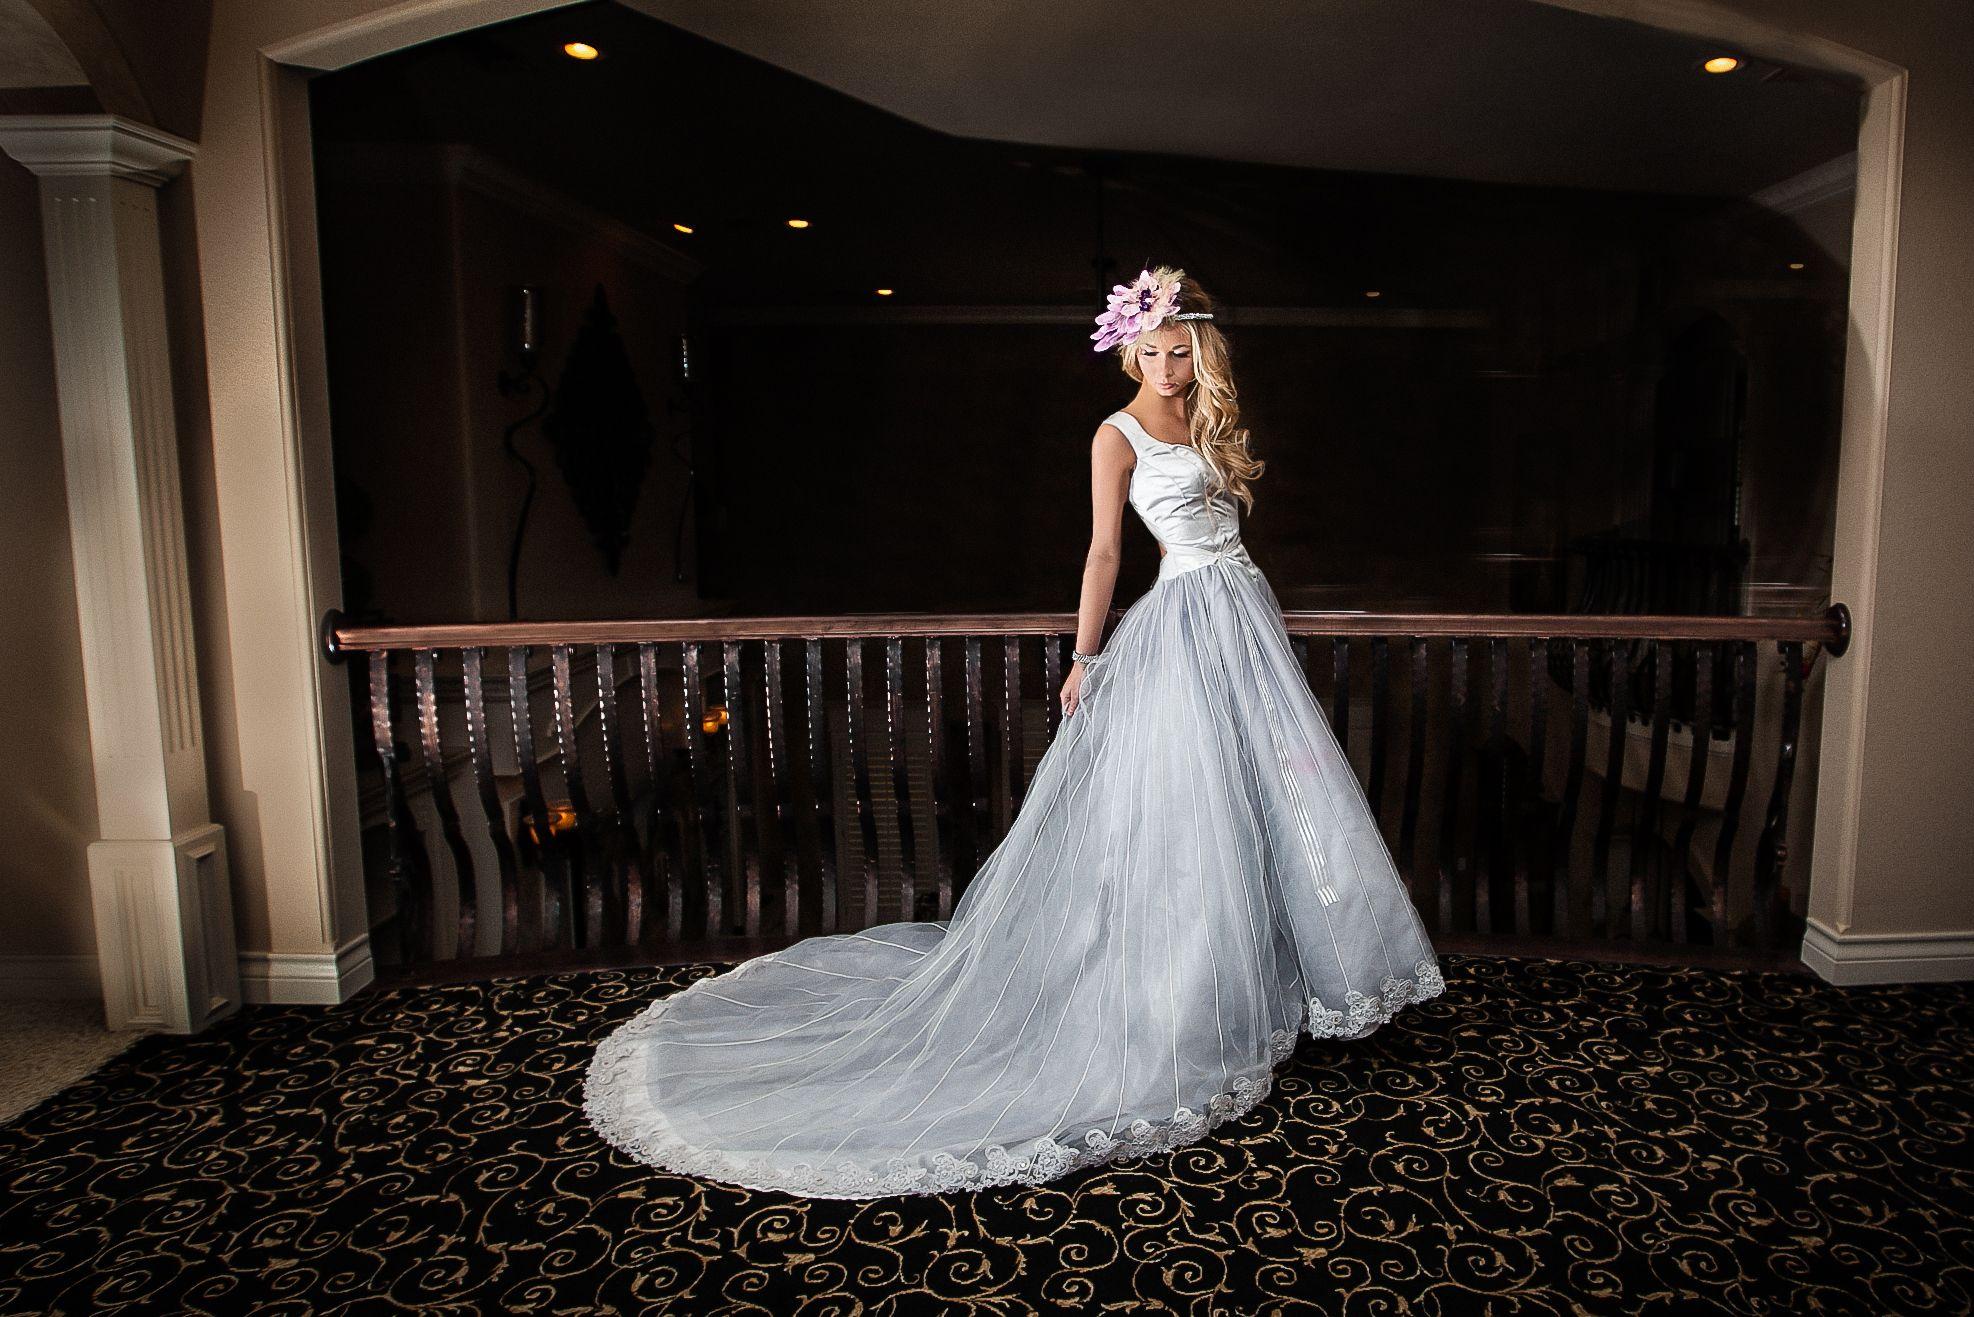 Kit Katherinemicheal Com Vintage Wedding Gown Dress Wedding Dress Blue Dress Blue Wedding Wedding Gowns Vintage Blue Wedding Gowns Blue Wedding Dresses [ 1317 x 1974 Pixel ]